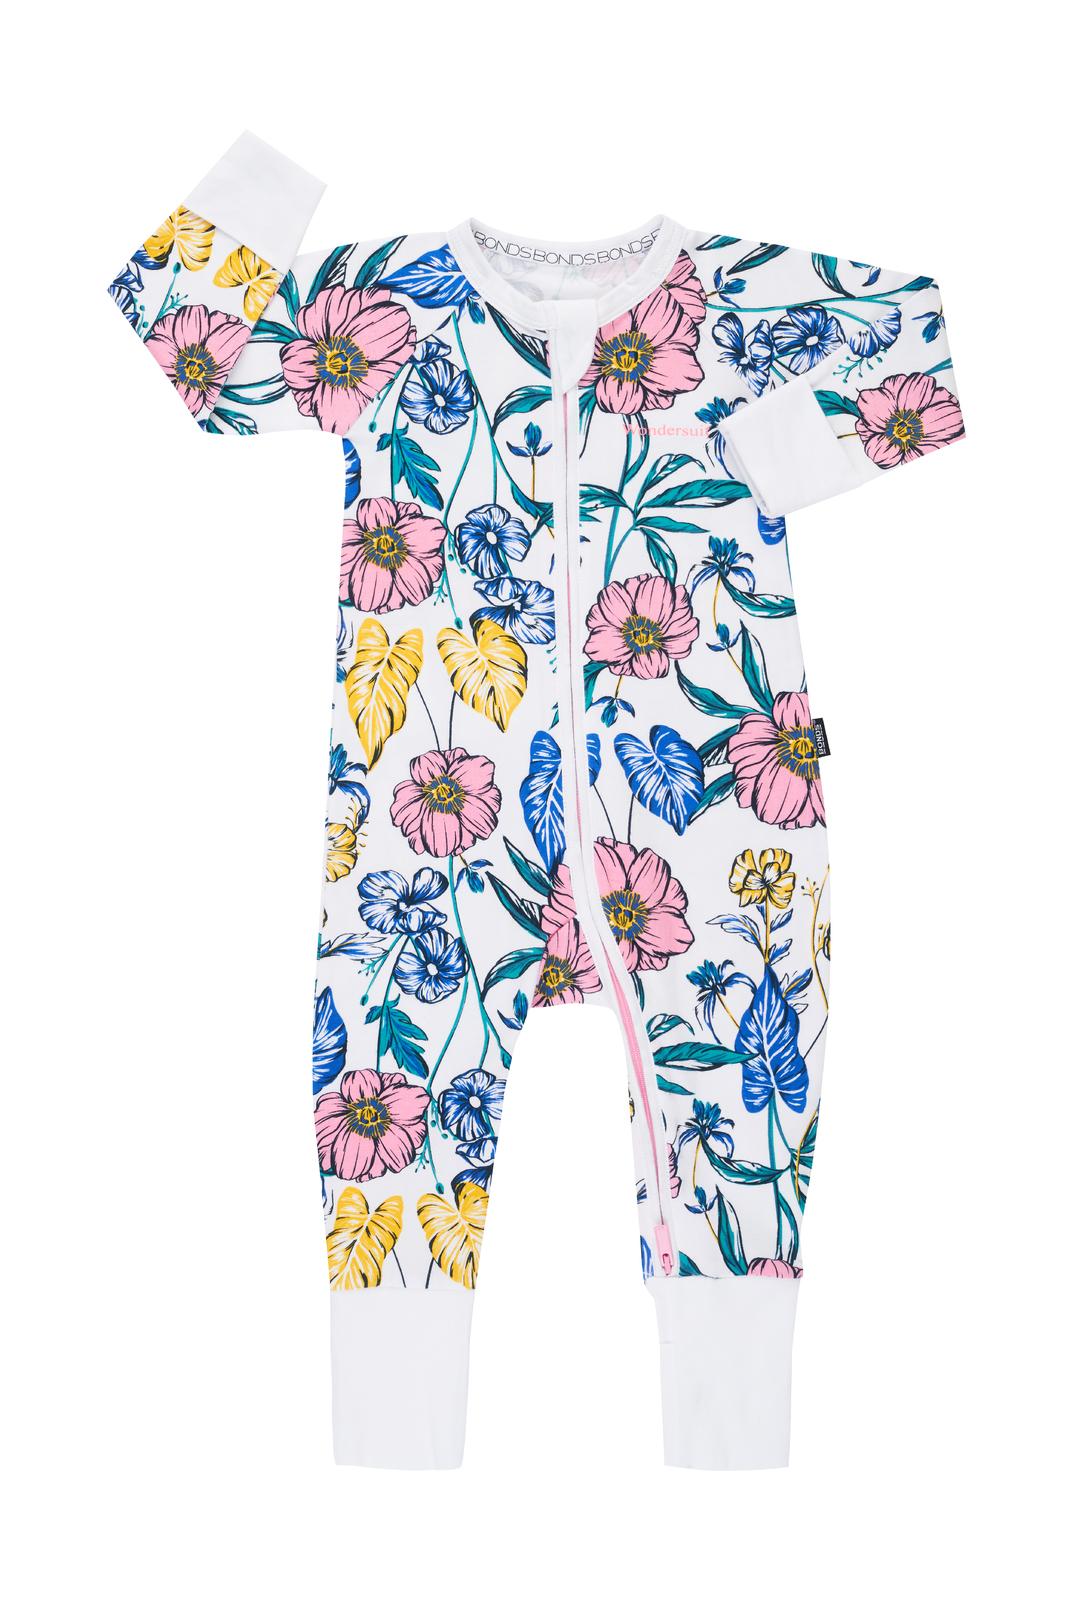 Bonds Zip Wondersuit Long Sleeve - Tomorrow Floral White (0-3 Months) image